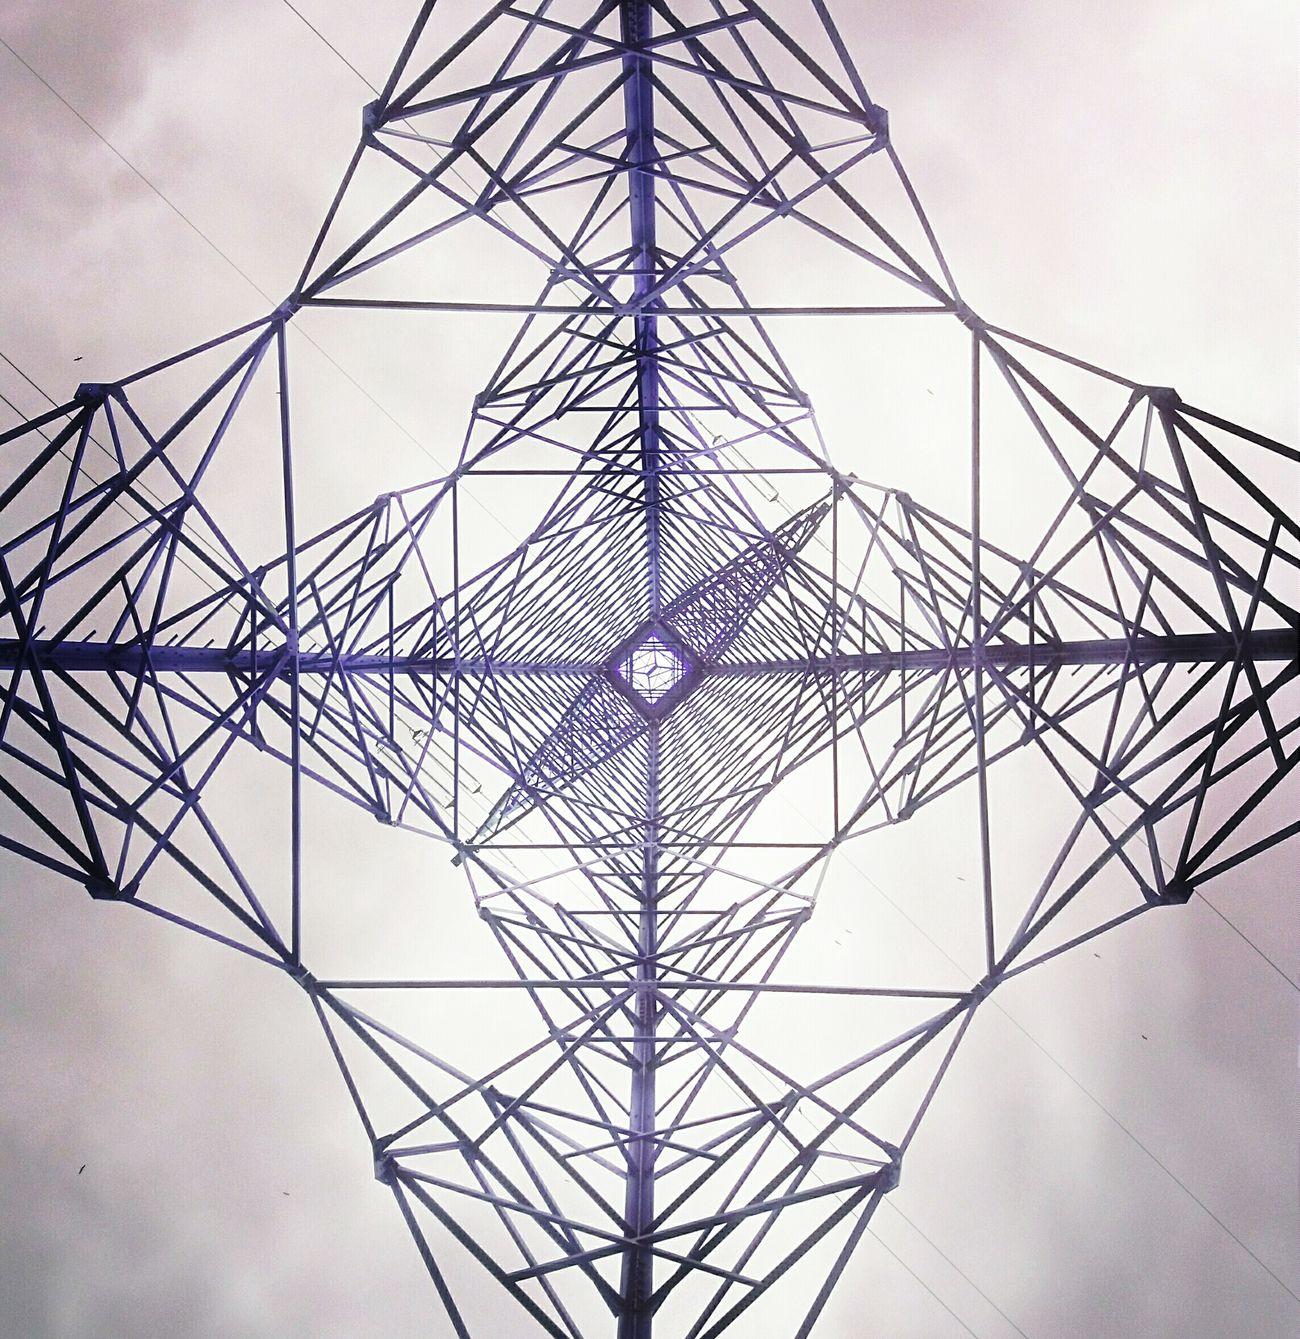 Pylon Symmetry Geometry Architecture Up EyeEm AMPt Community At Its Core